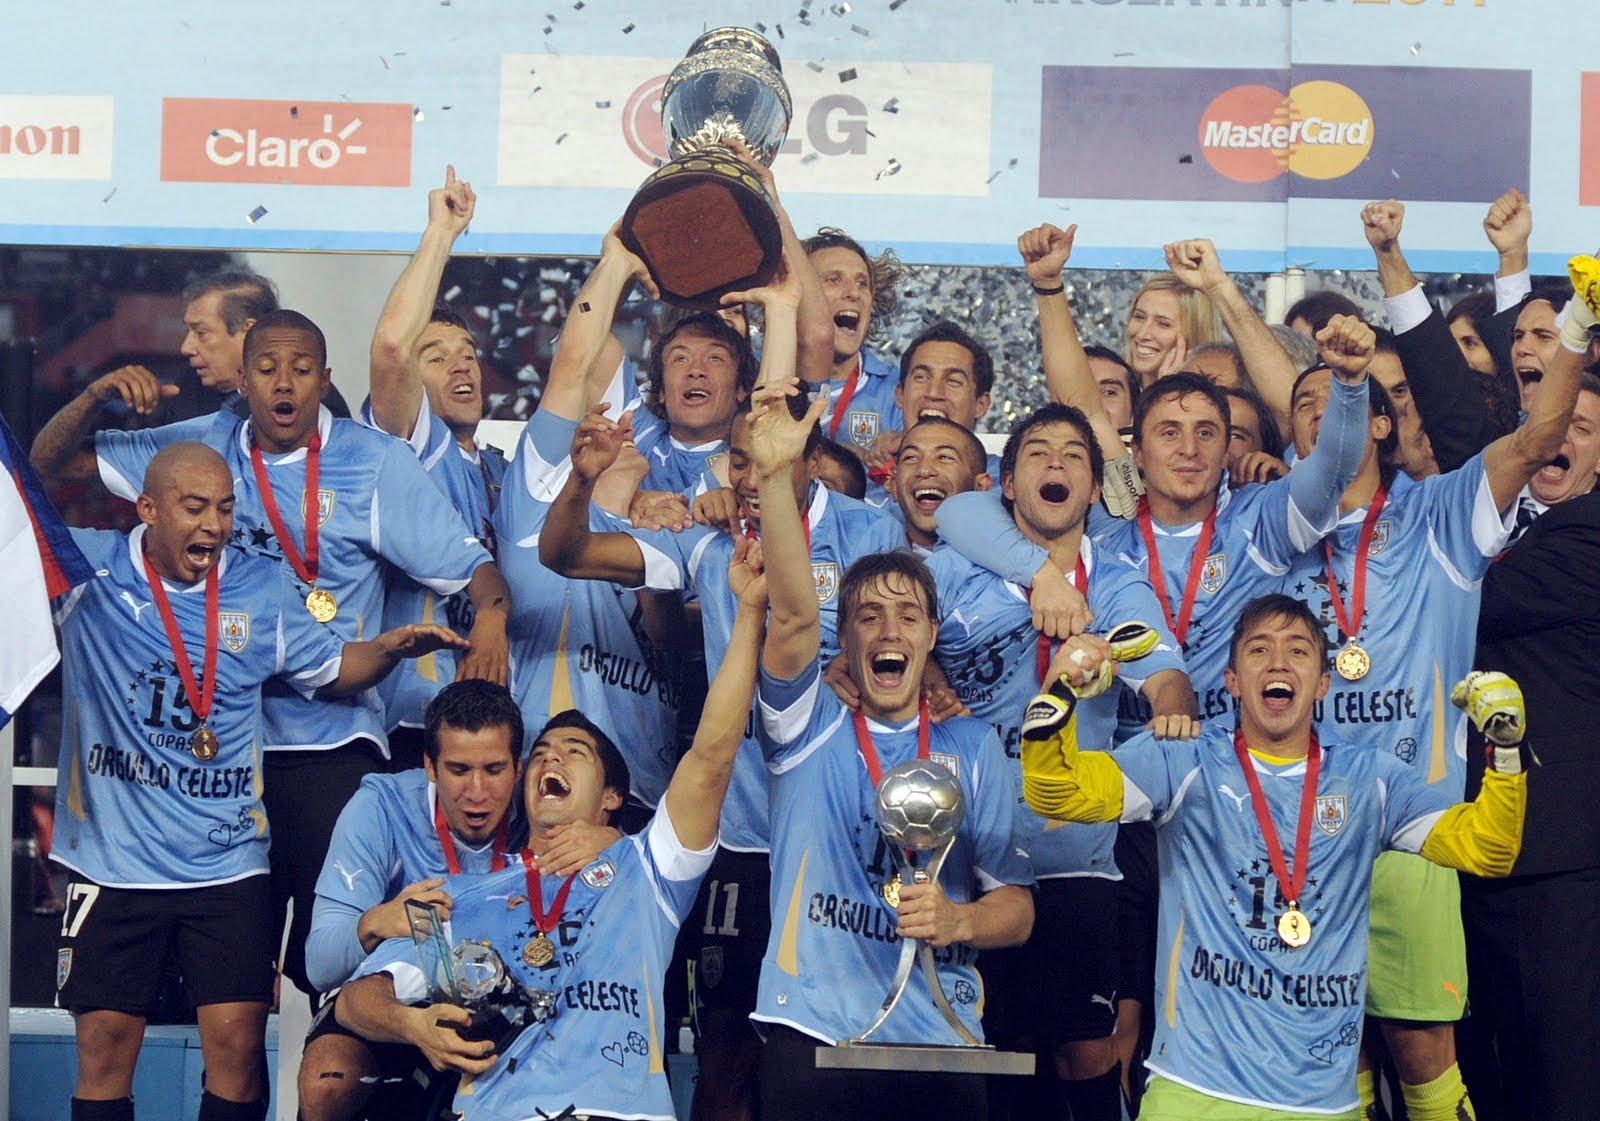 http://2.bp.blogspot.com/-6SSgv3OcQE0/TizS19JgUbI/AAAAAAAACtk/sY3aeUcBUxg/s1600/Uruguay-Campeon-Copa-America-2011.jpg